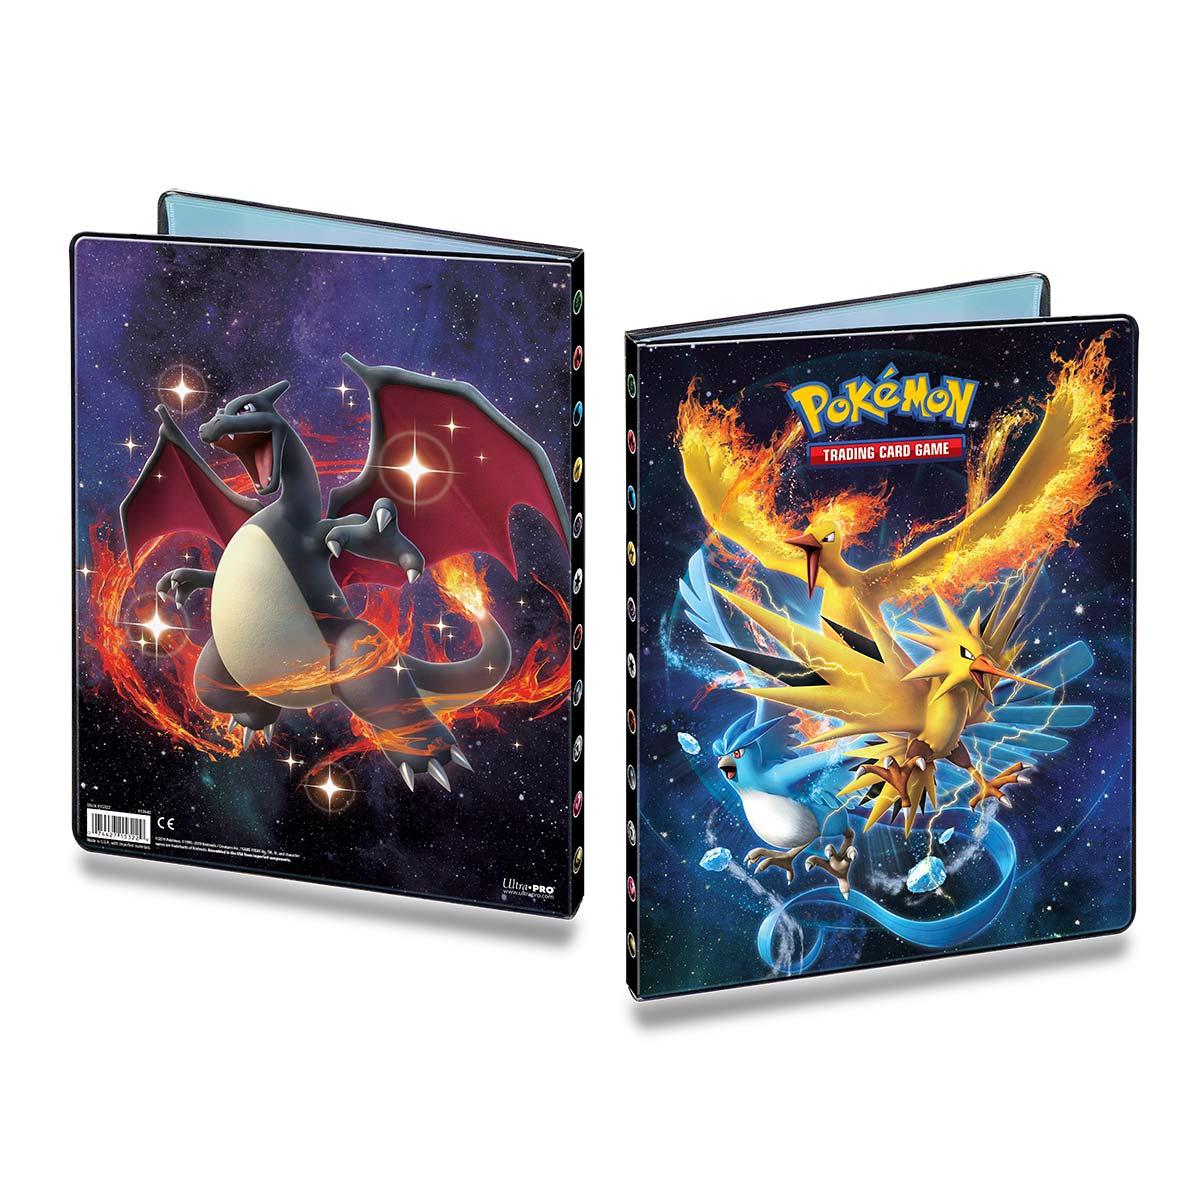 Pokémon: Hidden Fates - A4 album